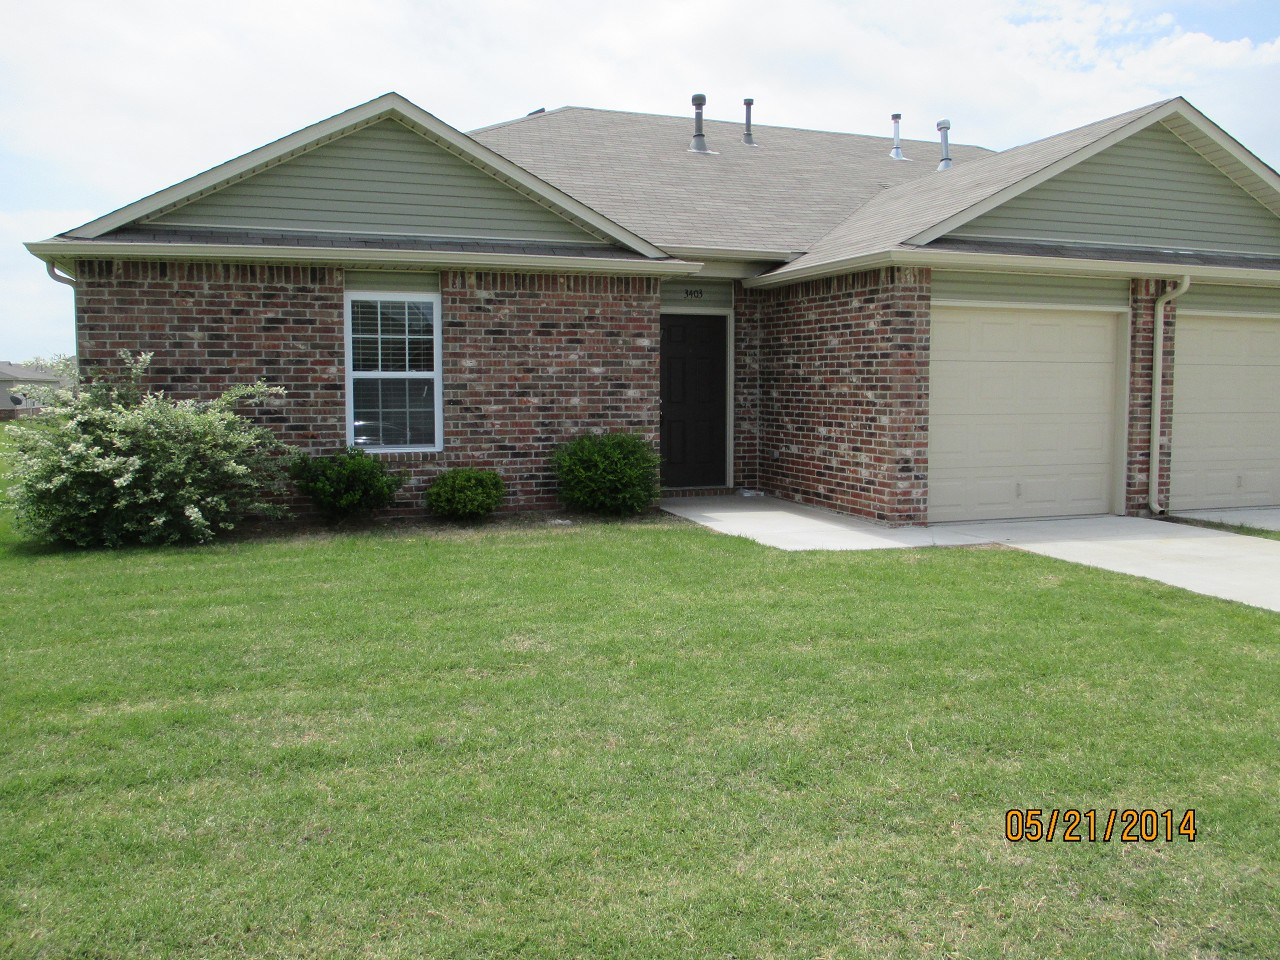 Single Family Home for Sale, ListingId:28569609, location: 3403 E Irvington Place Broken Arrow 74014